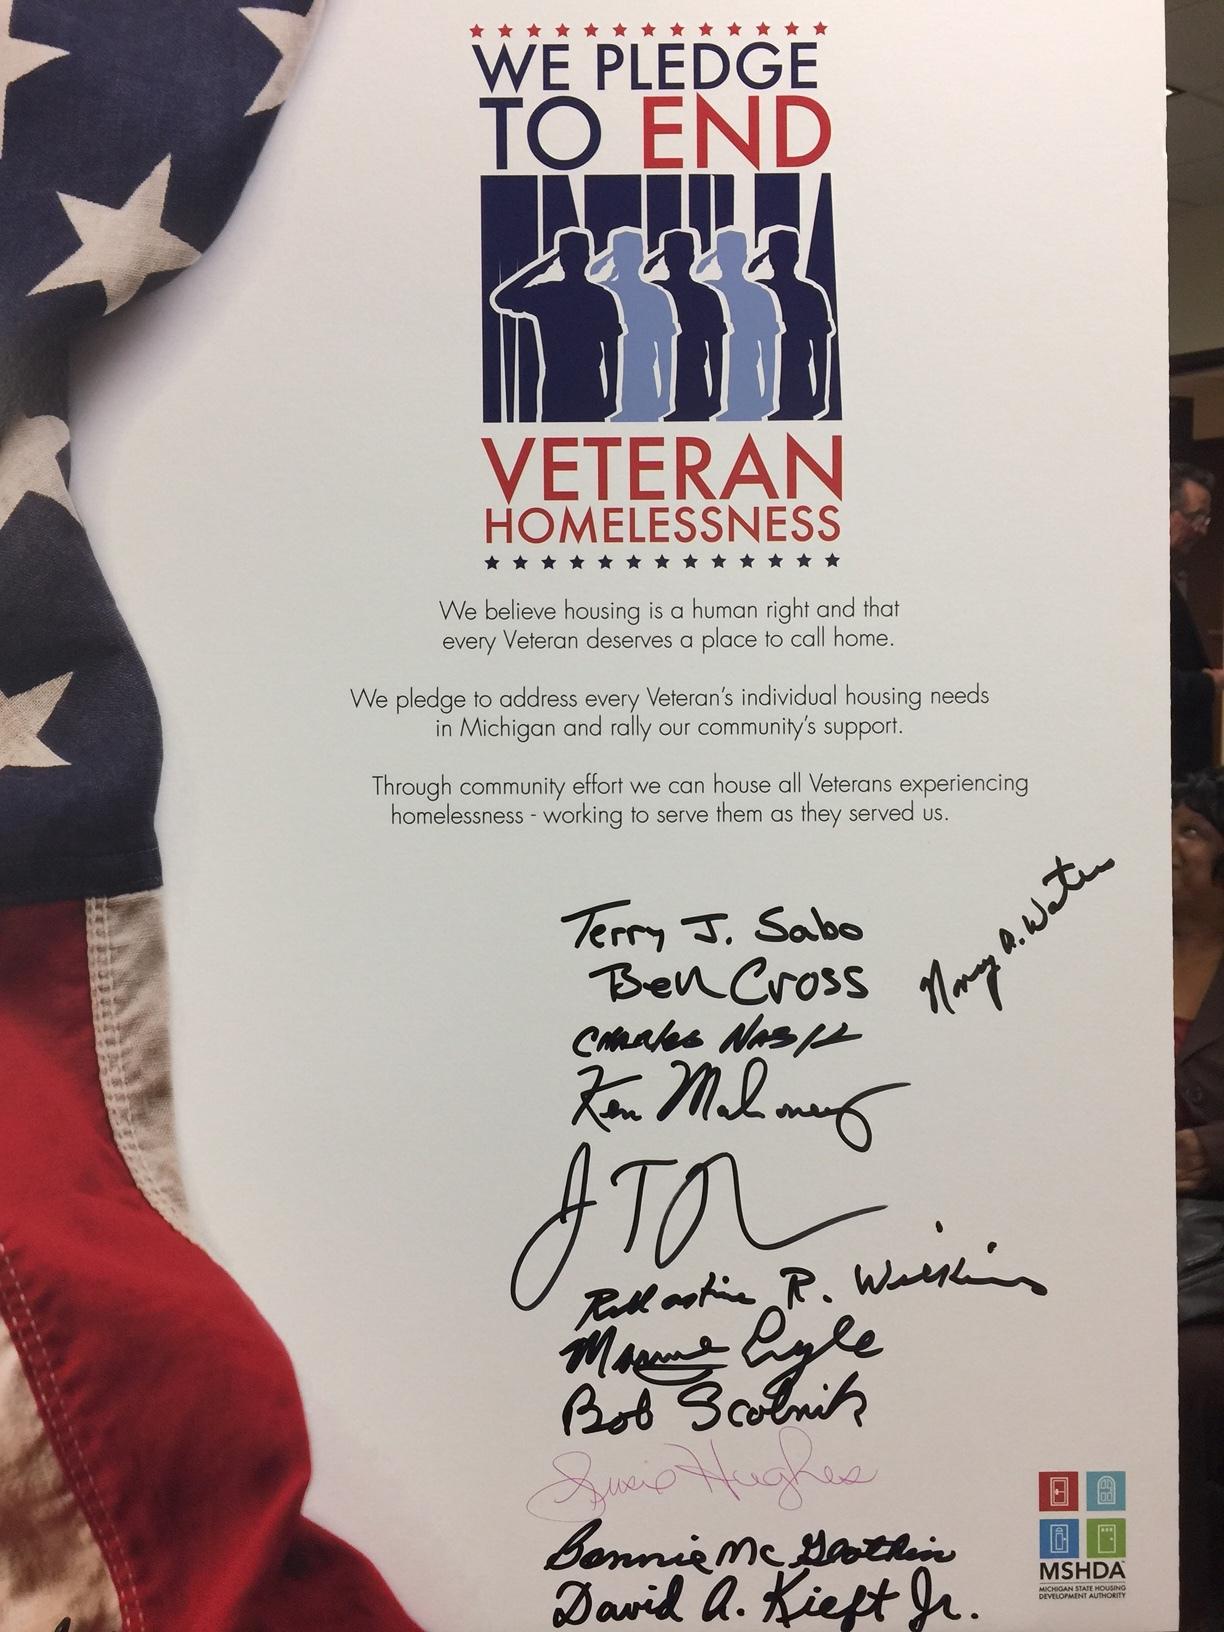 The signed Pledge.